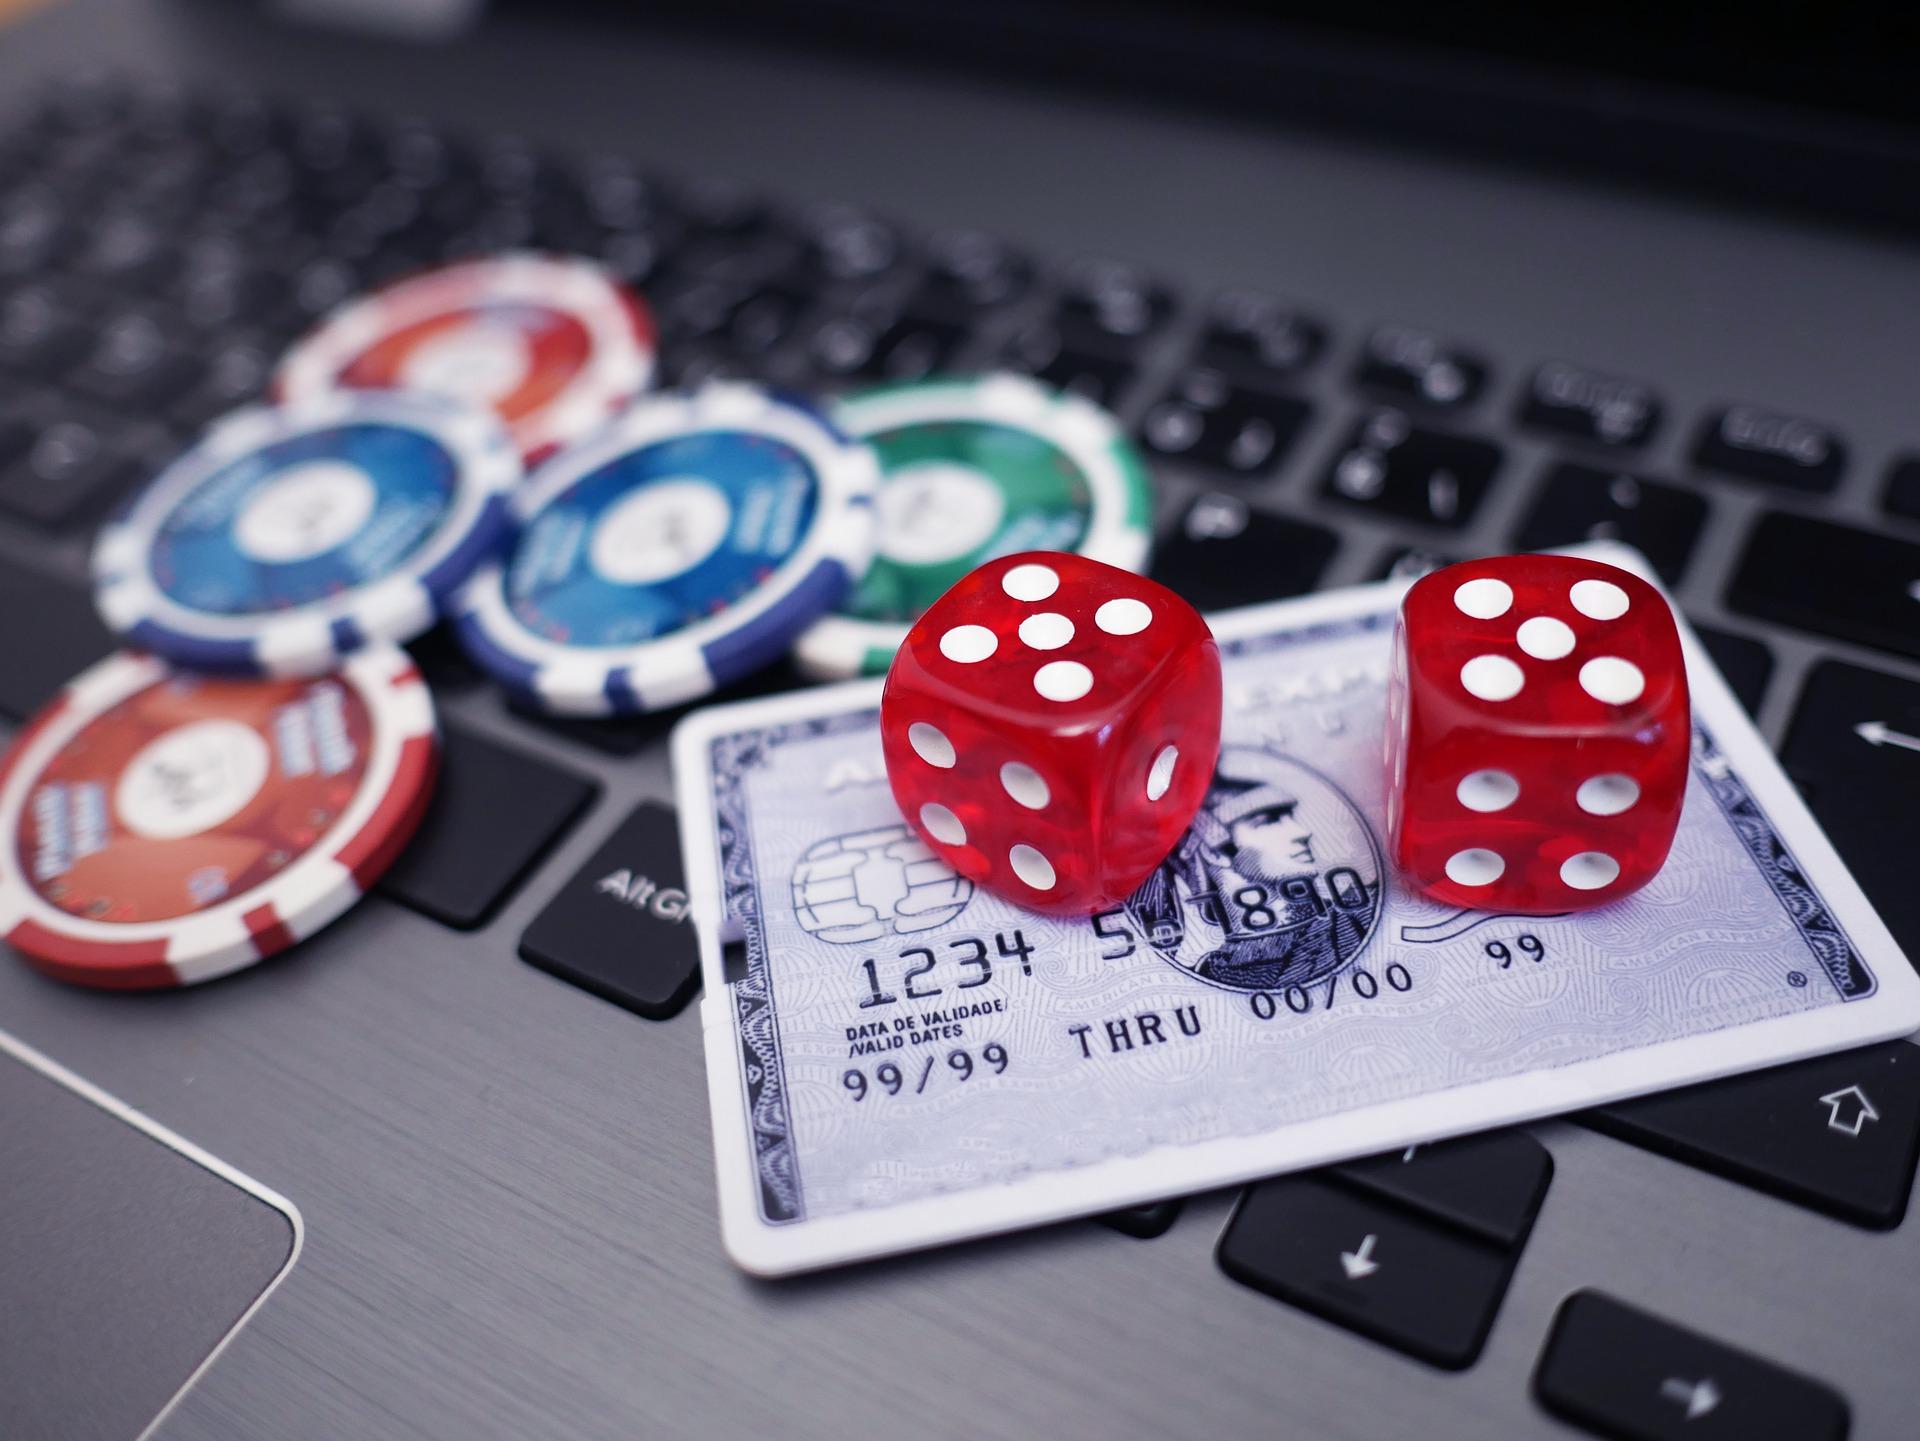 Twitch readies casino link ban